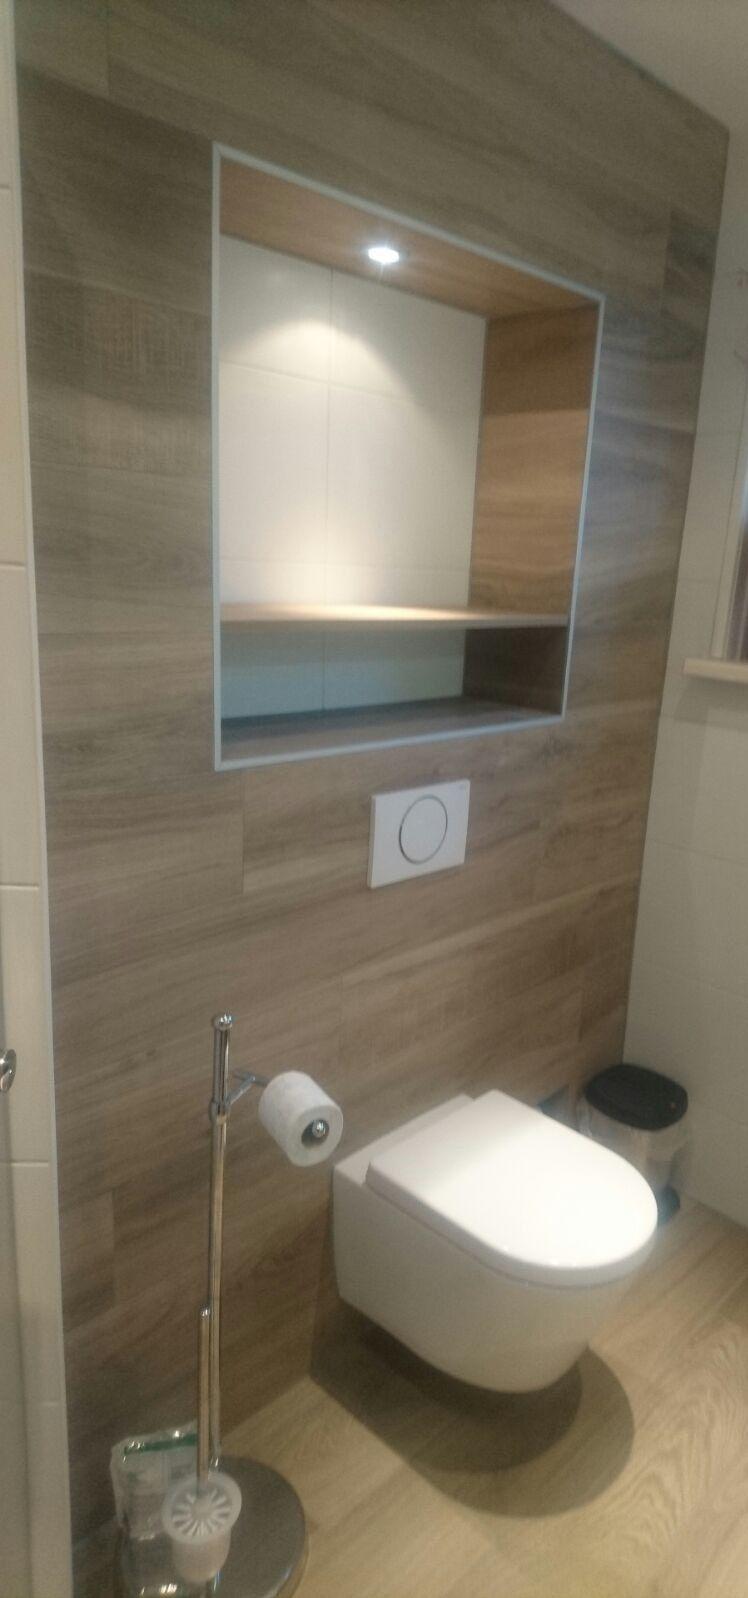 Moderne badkamer met planken tegels wc pinterest toilet - Badkamer wc ...